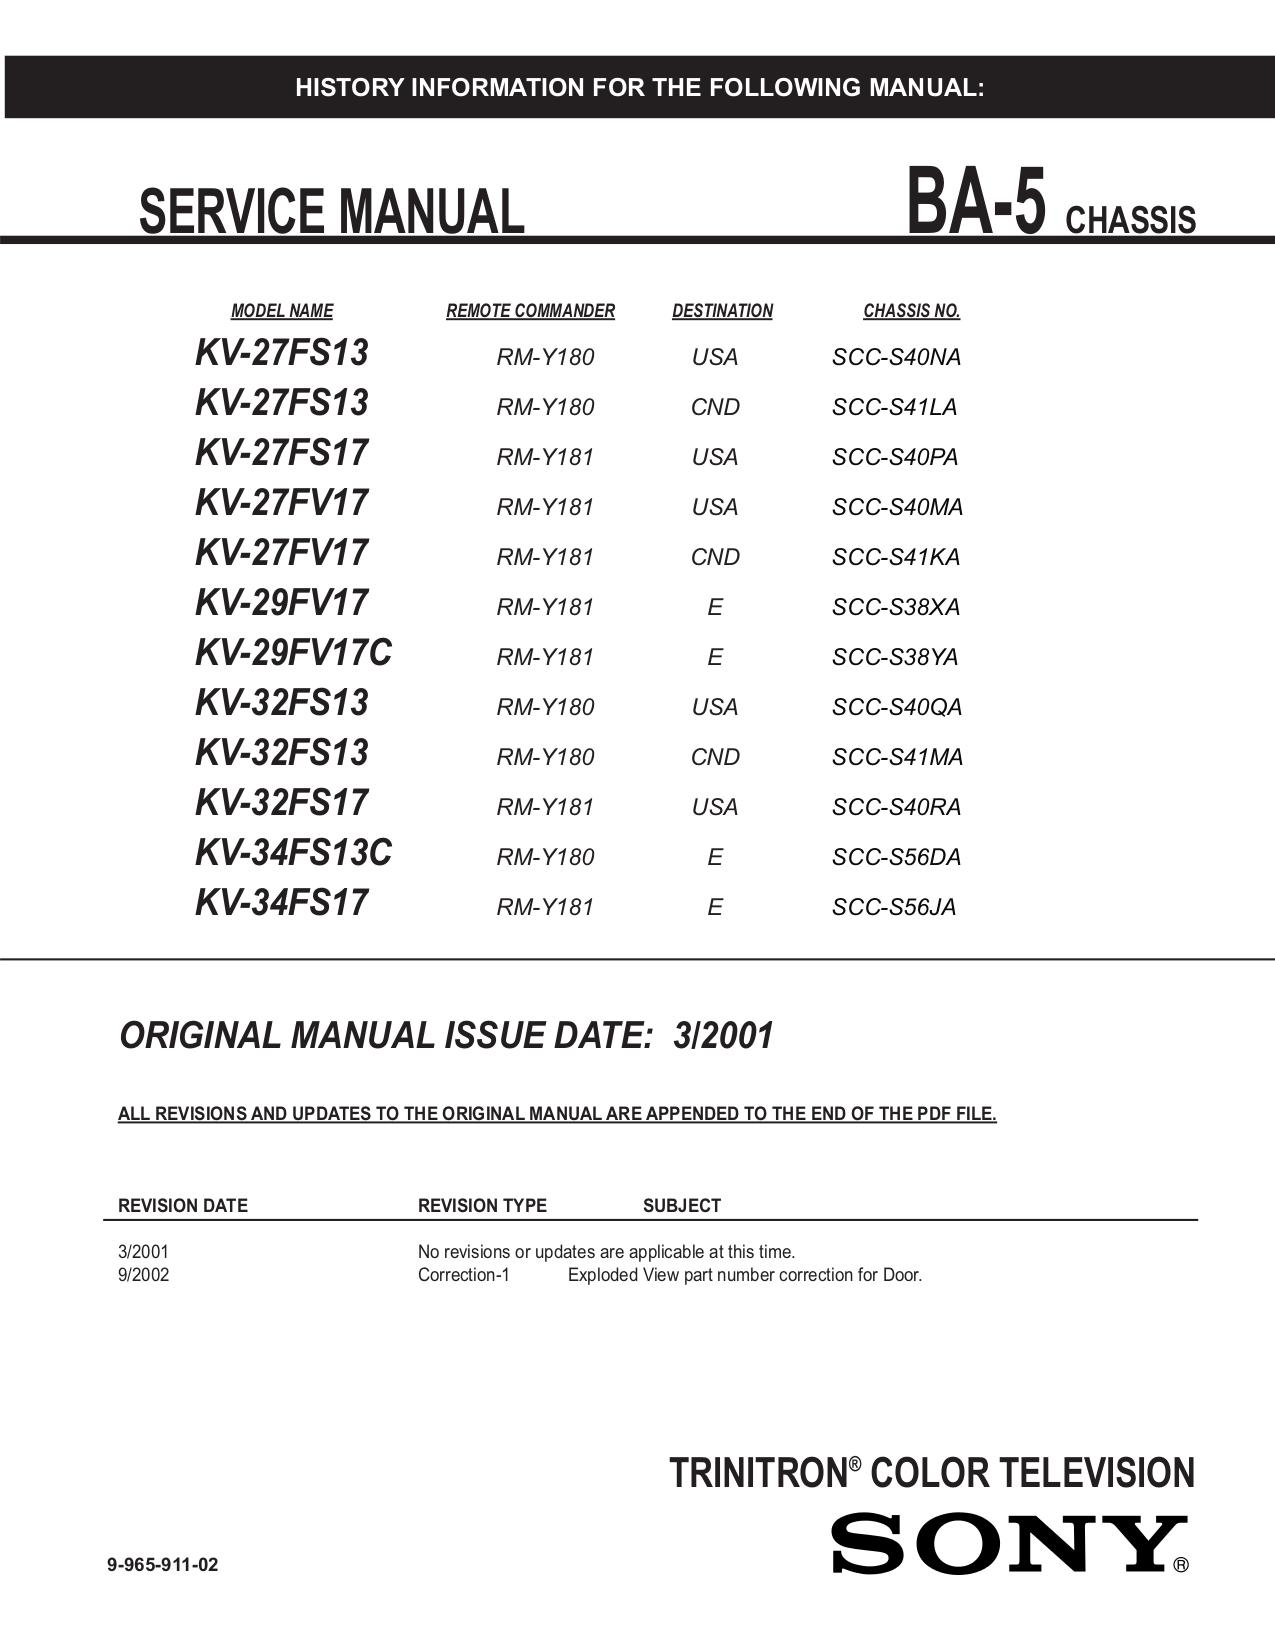 pdf manual for sony tv wega kv 27fs13 rh umlib com Sony User Manuals Sony User Manuals